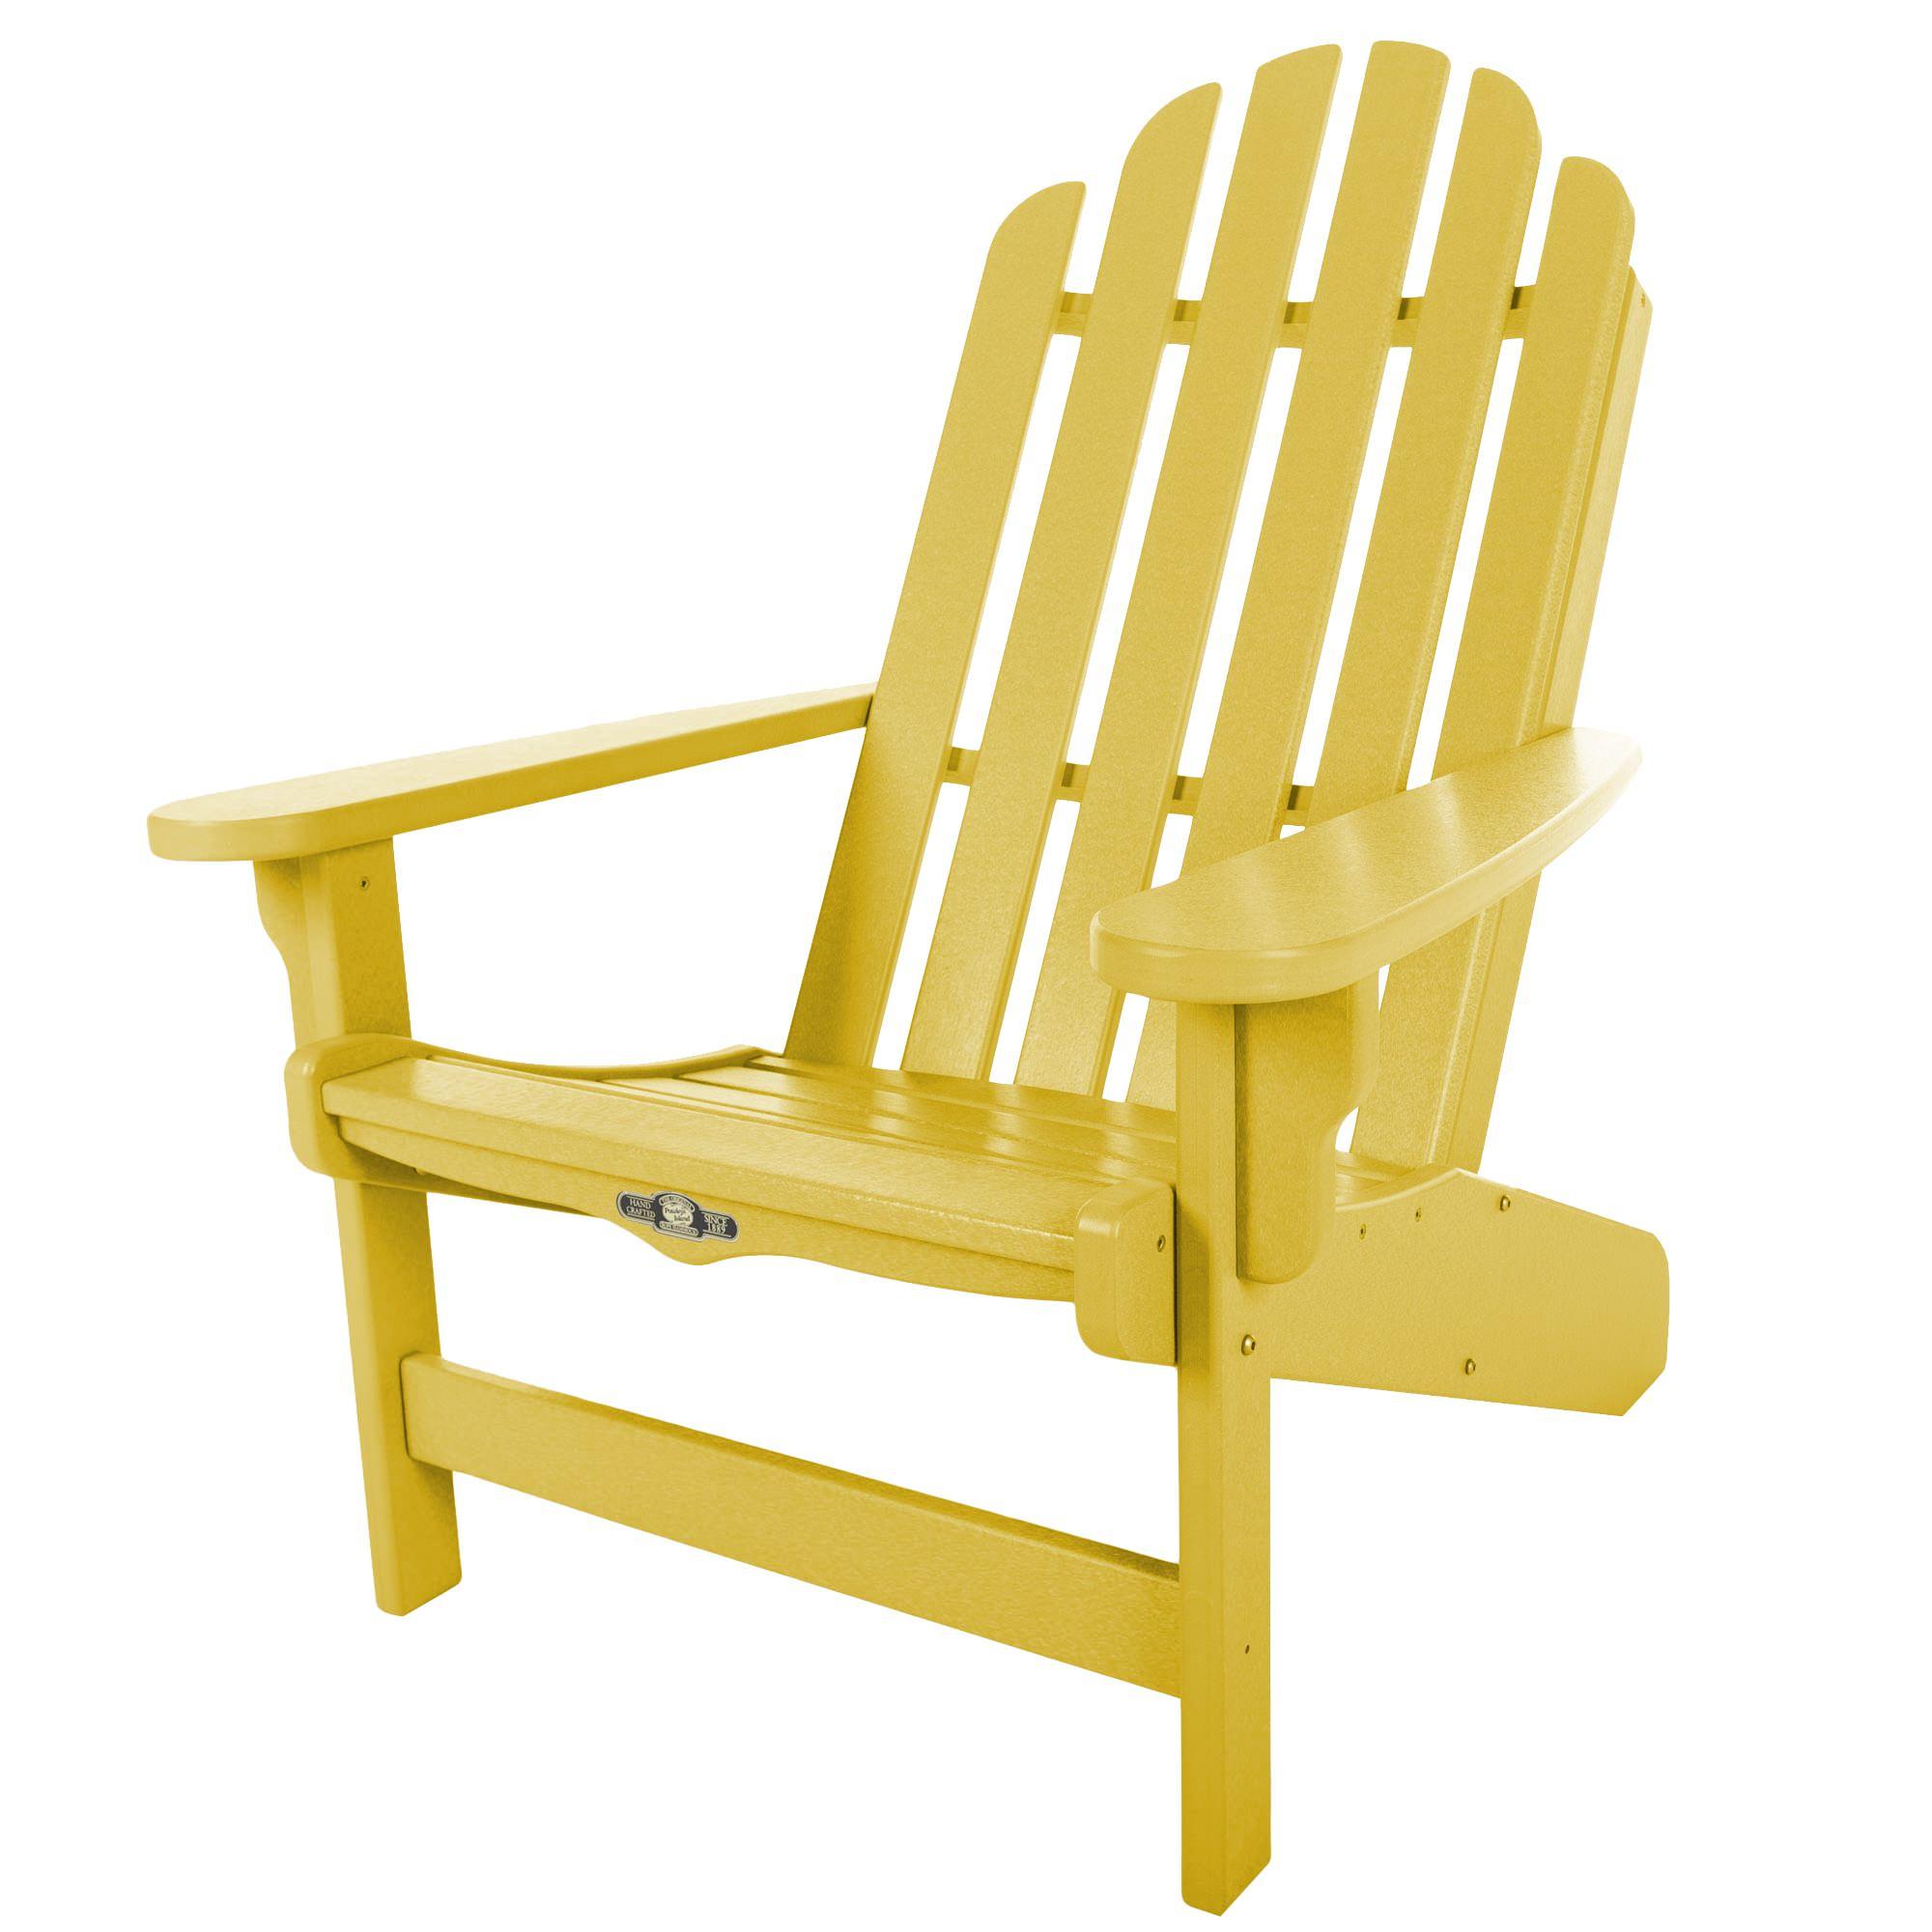 yellow adirondack chairs plastic carpet chair mat target essentials durawood pawleys island sku